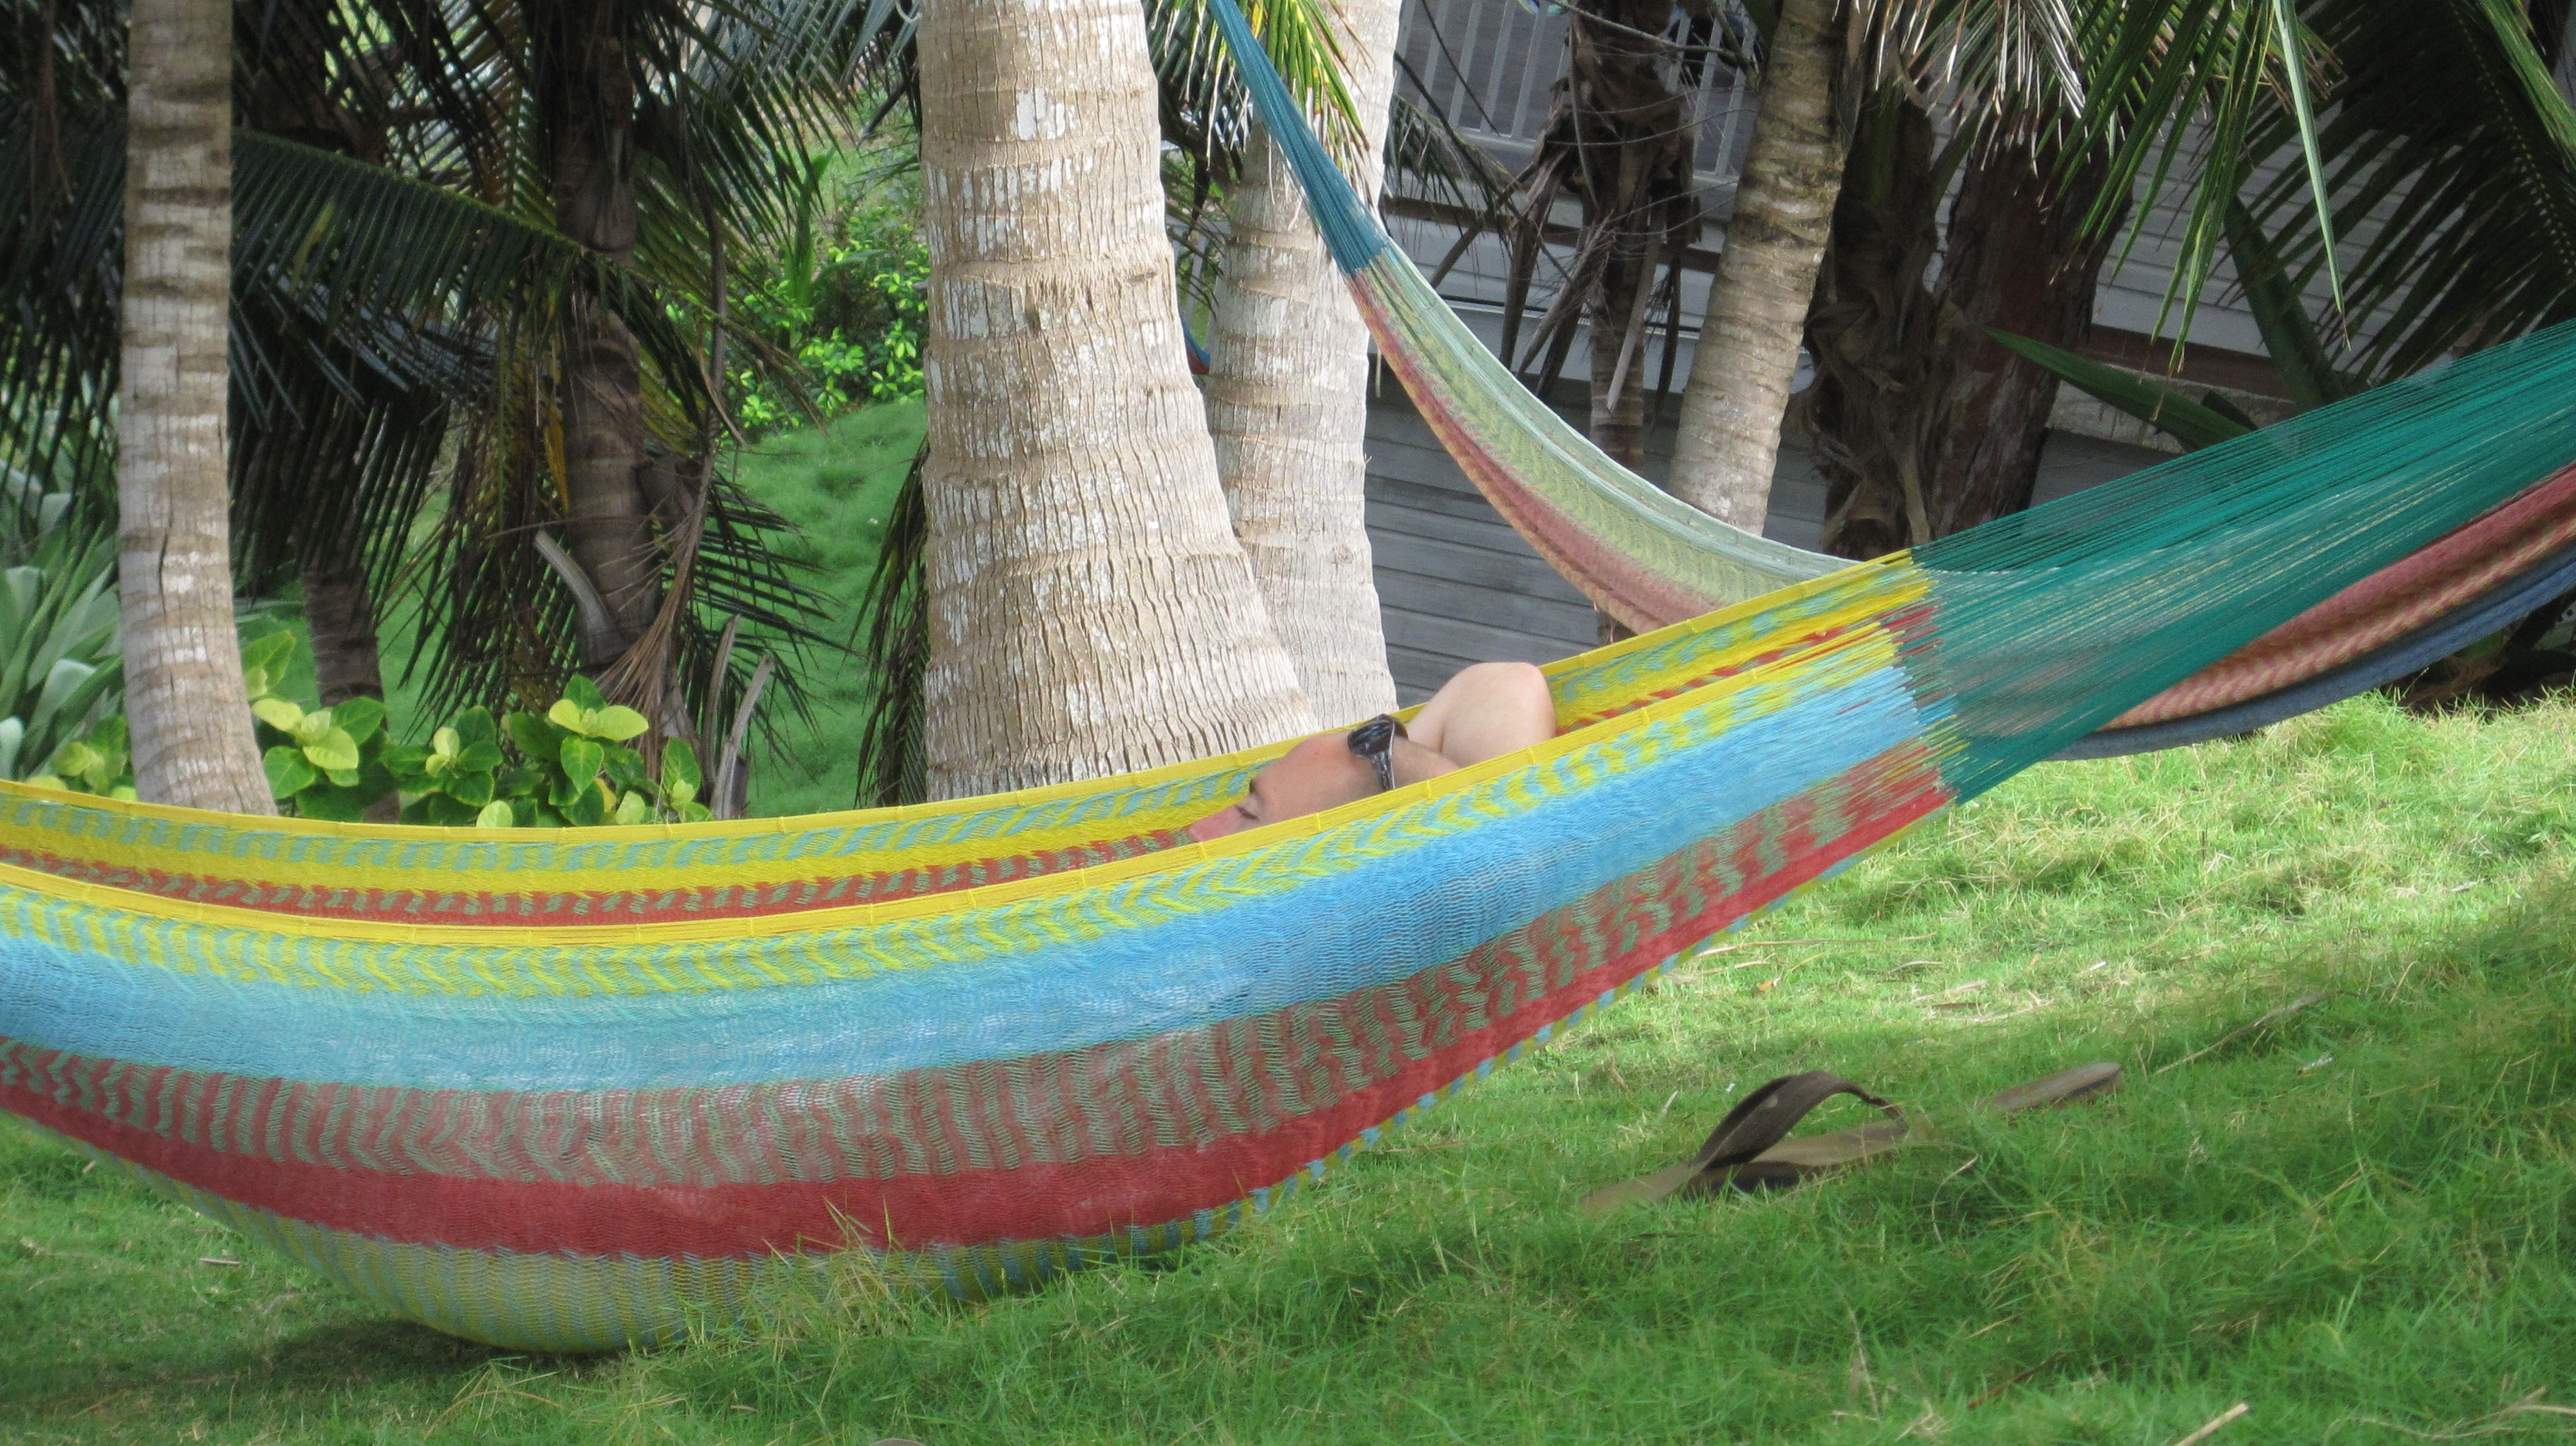 high above bathsheba beach on barbados' wild coast, hammocks are